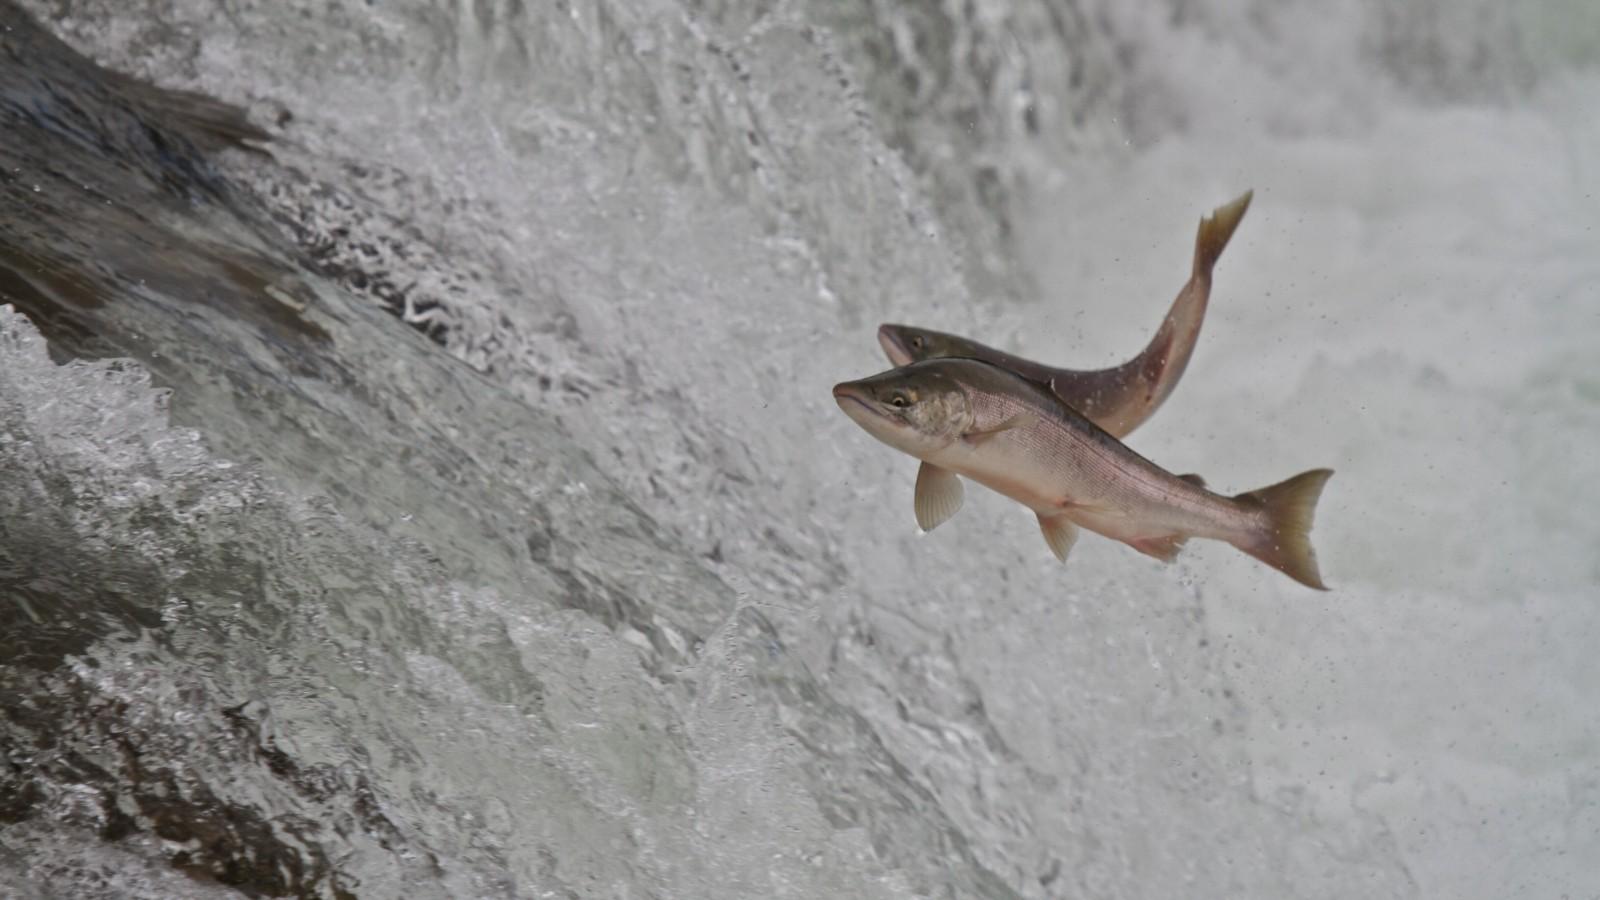 Nevada's West Coast Salmon to use Israeli fish-farm tech - ISRAEL21c